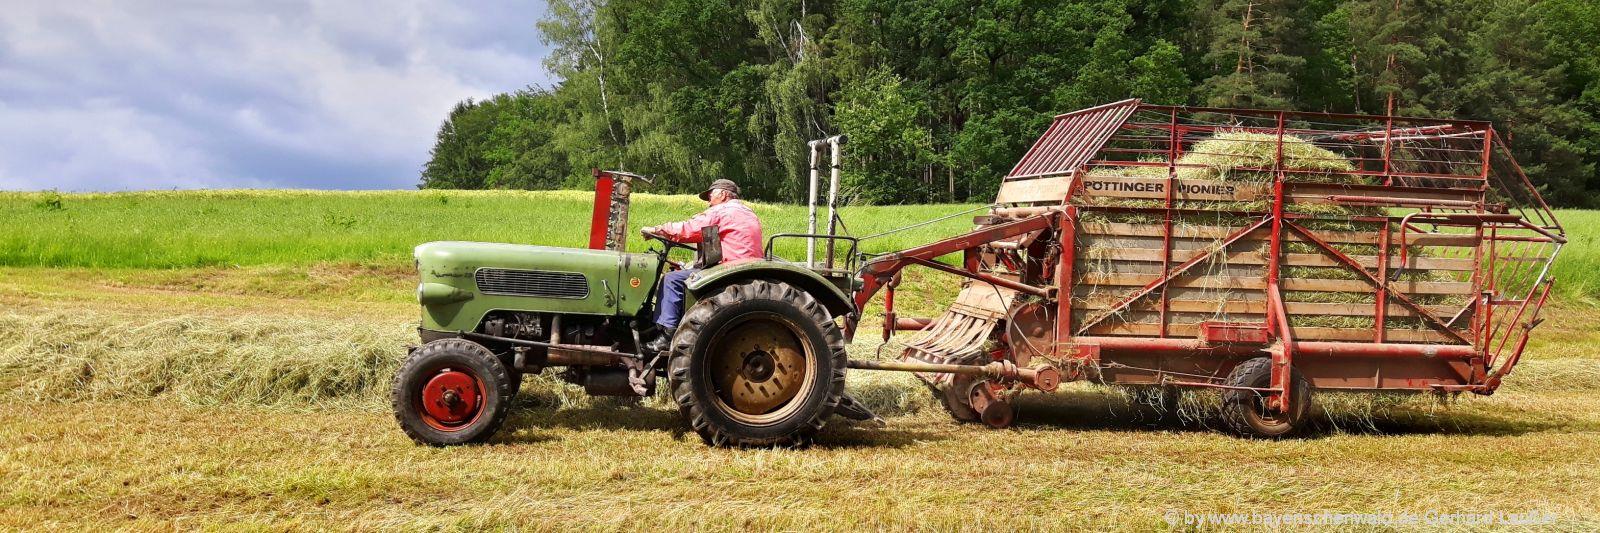 bayern-bauernhofurlaub-bayerischer-wald-traktor-fahren